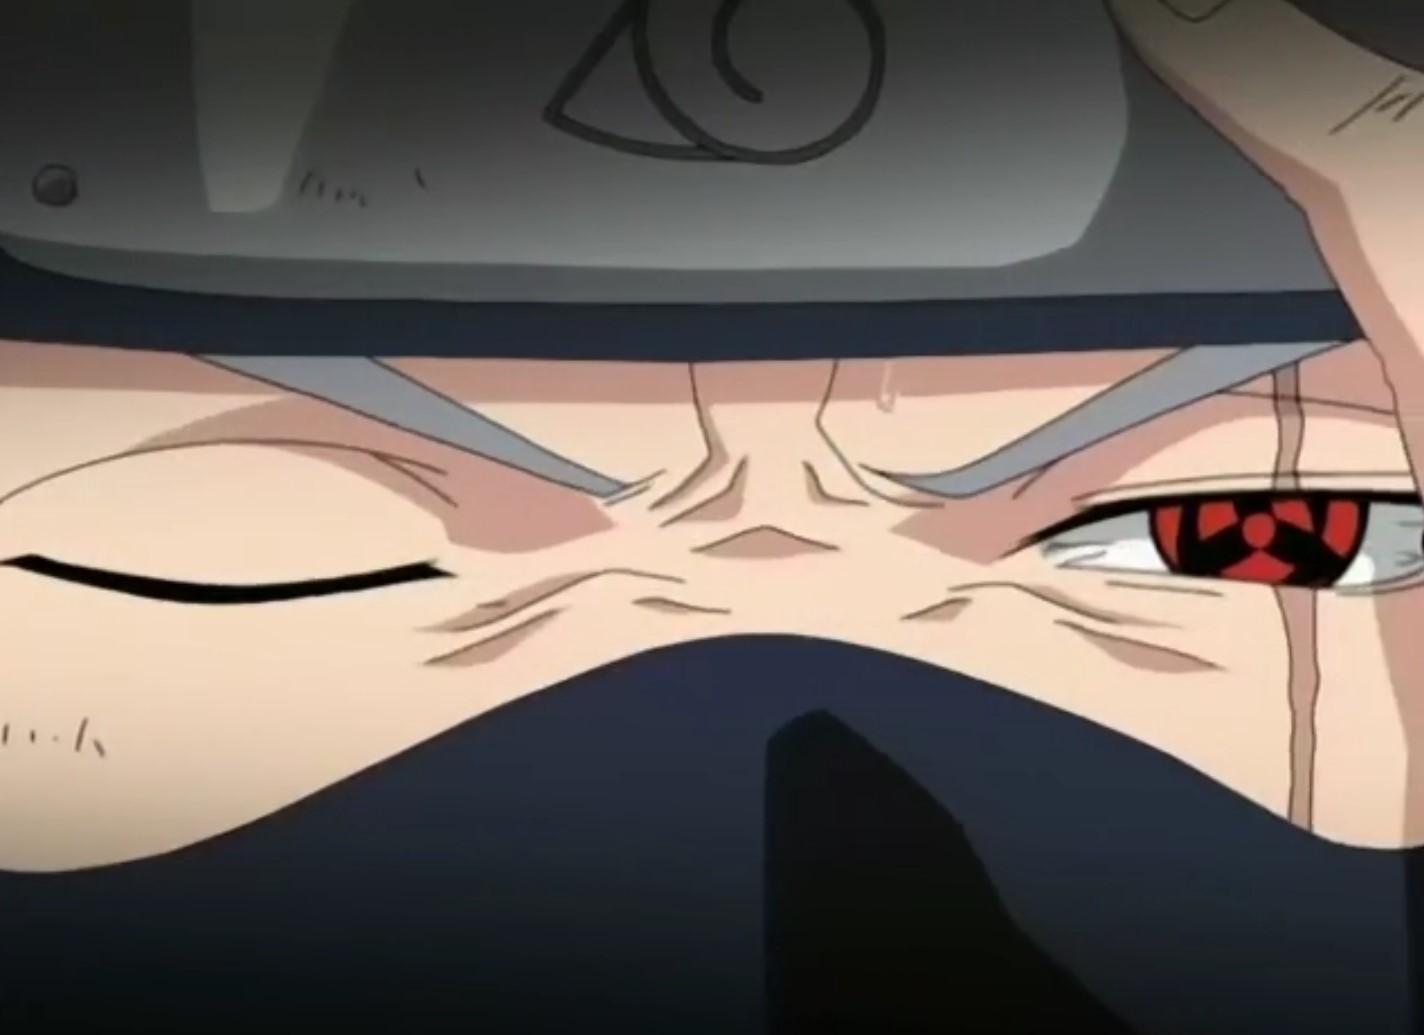 Naruto Shippuden Episódio 29-30, Assistir Naruto Shippuden Episódio 29-30, Assistir Naruto Shippuden Legendado, Naruto Shippuden episódio 29-30,HD